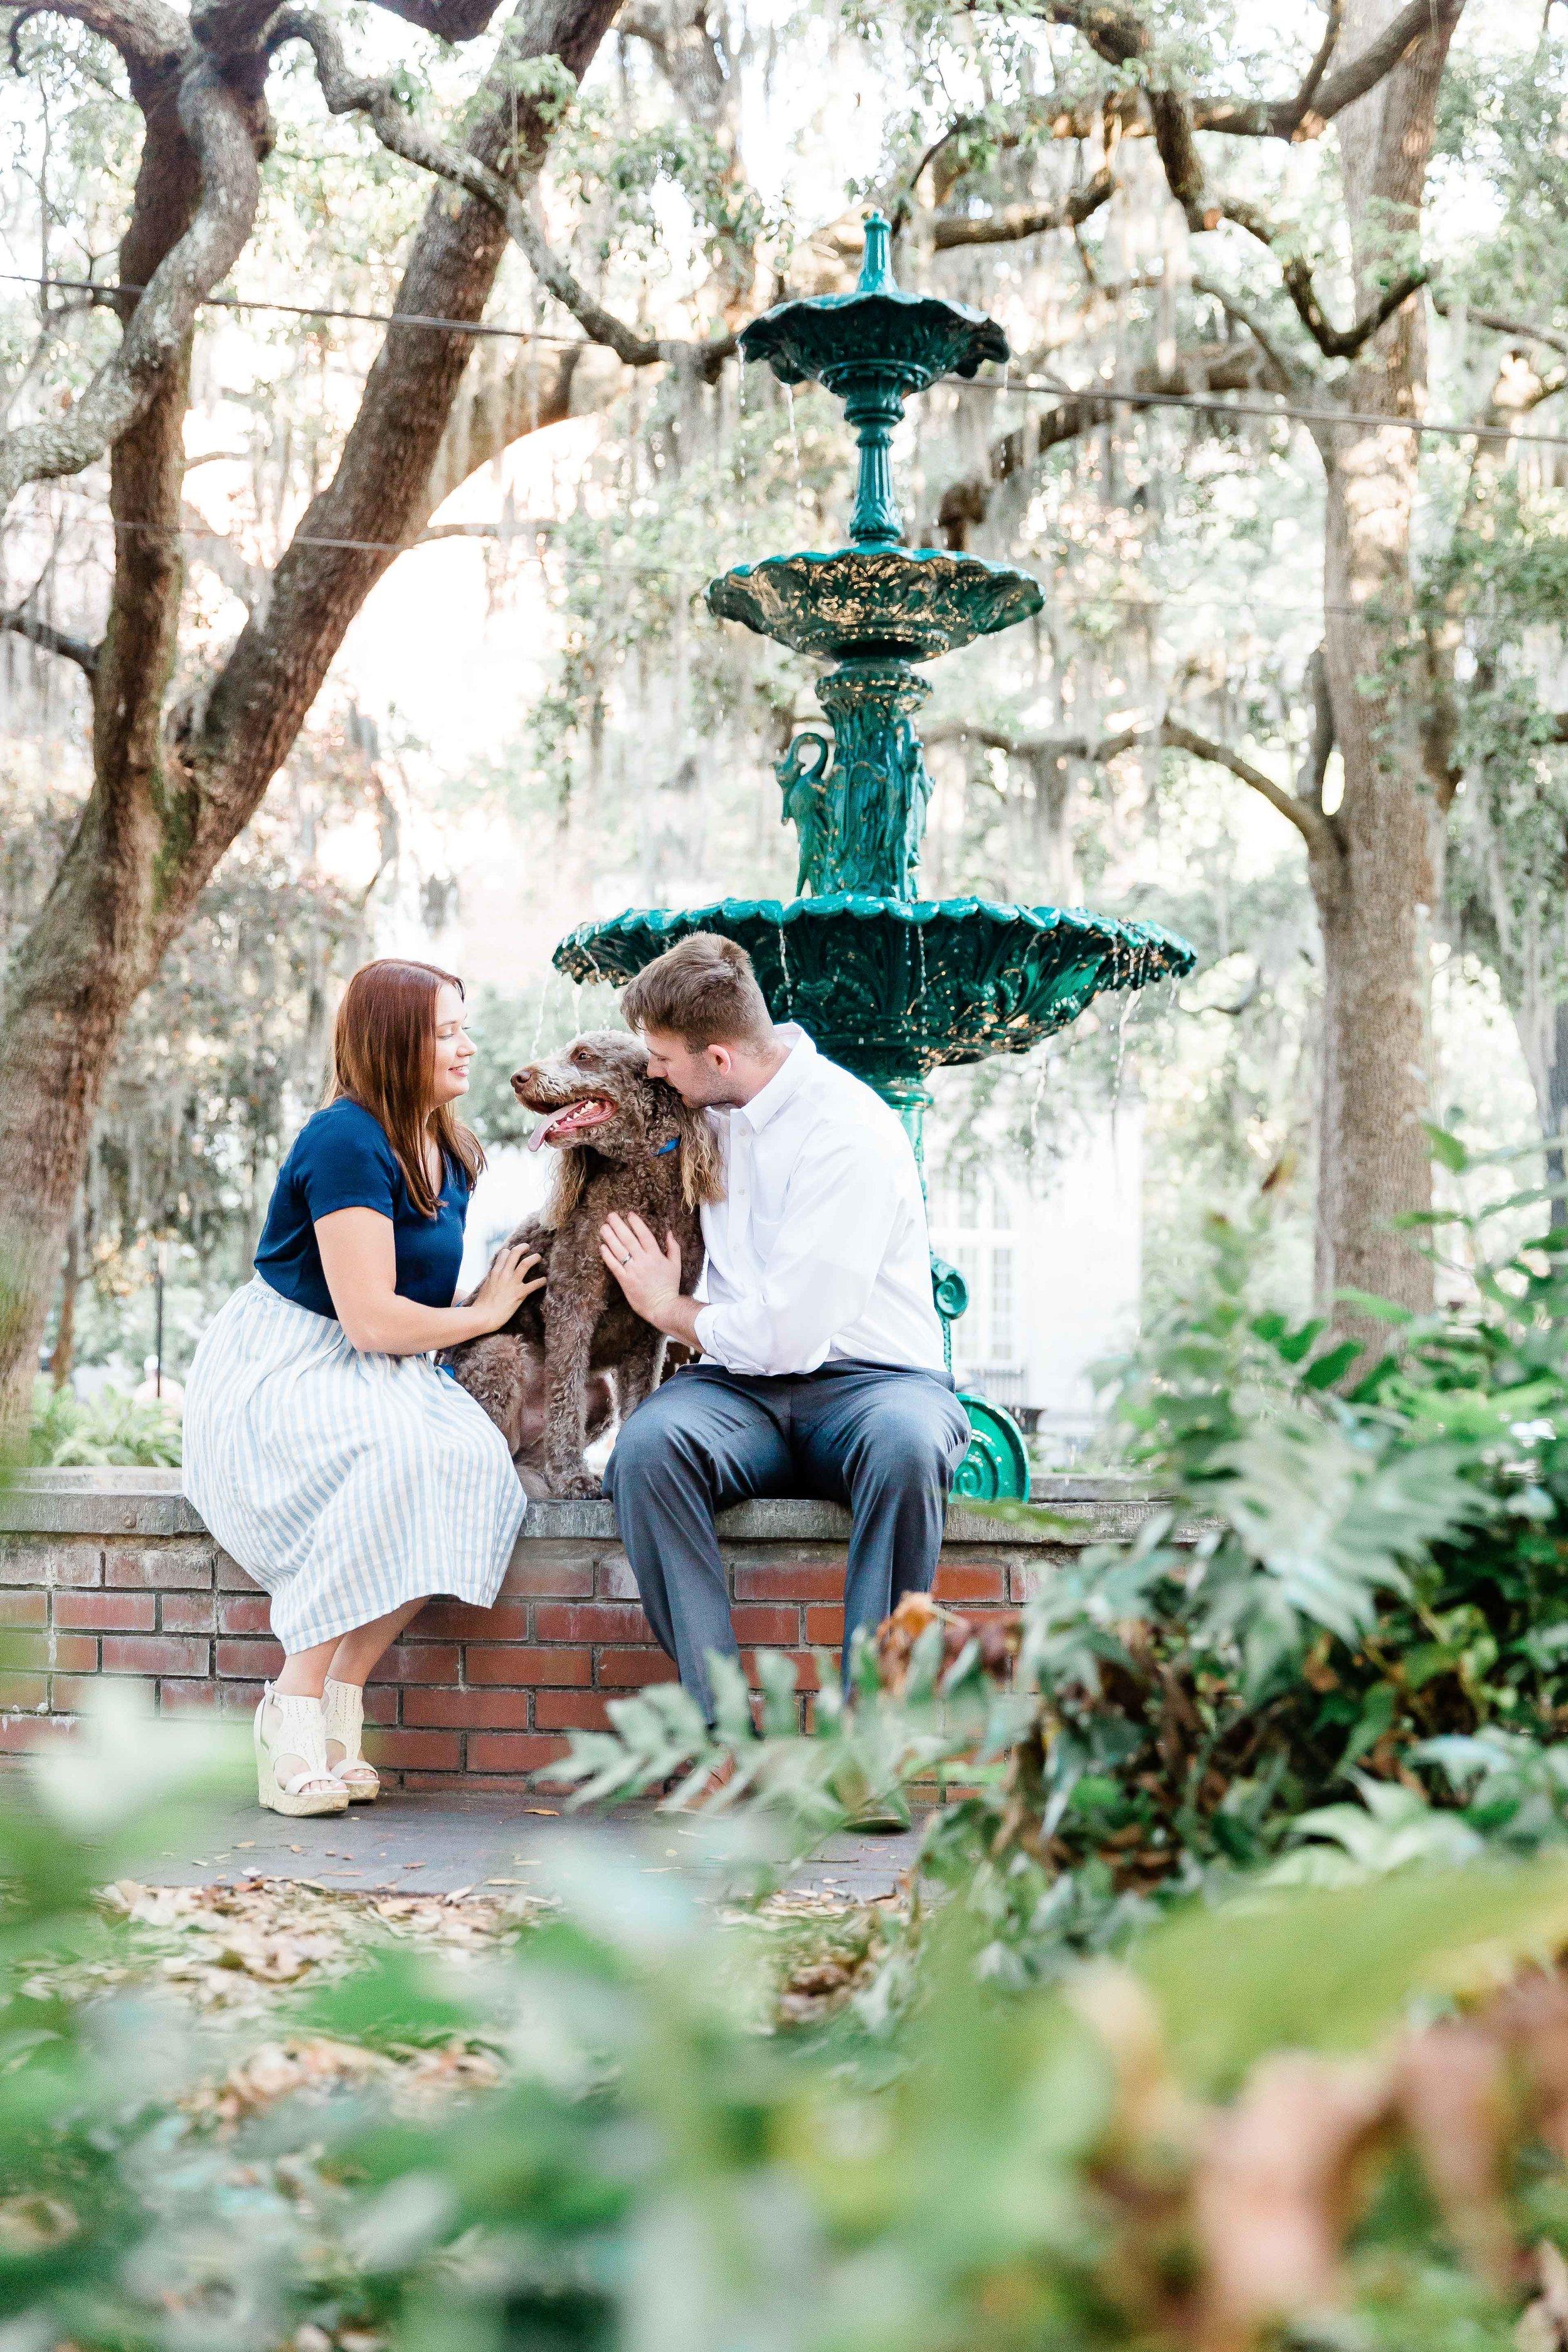 20190519Georgia-Savannah-Kristen & Zach-Forsyth Park-Lafayette Square13.jpg